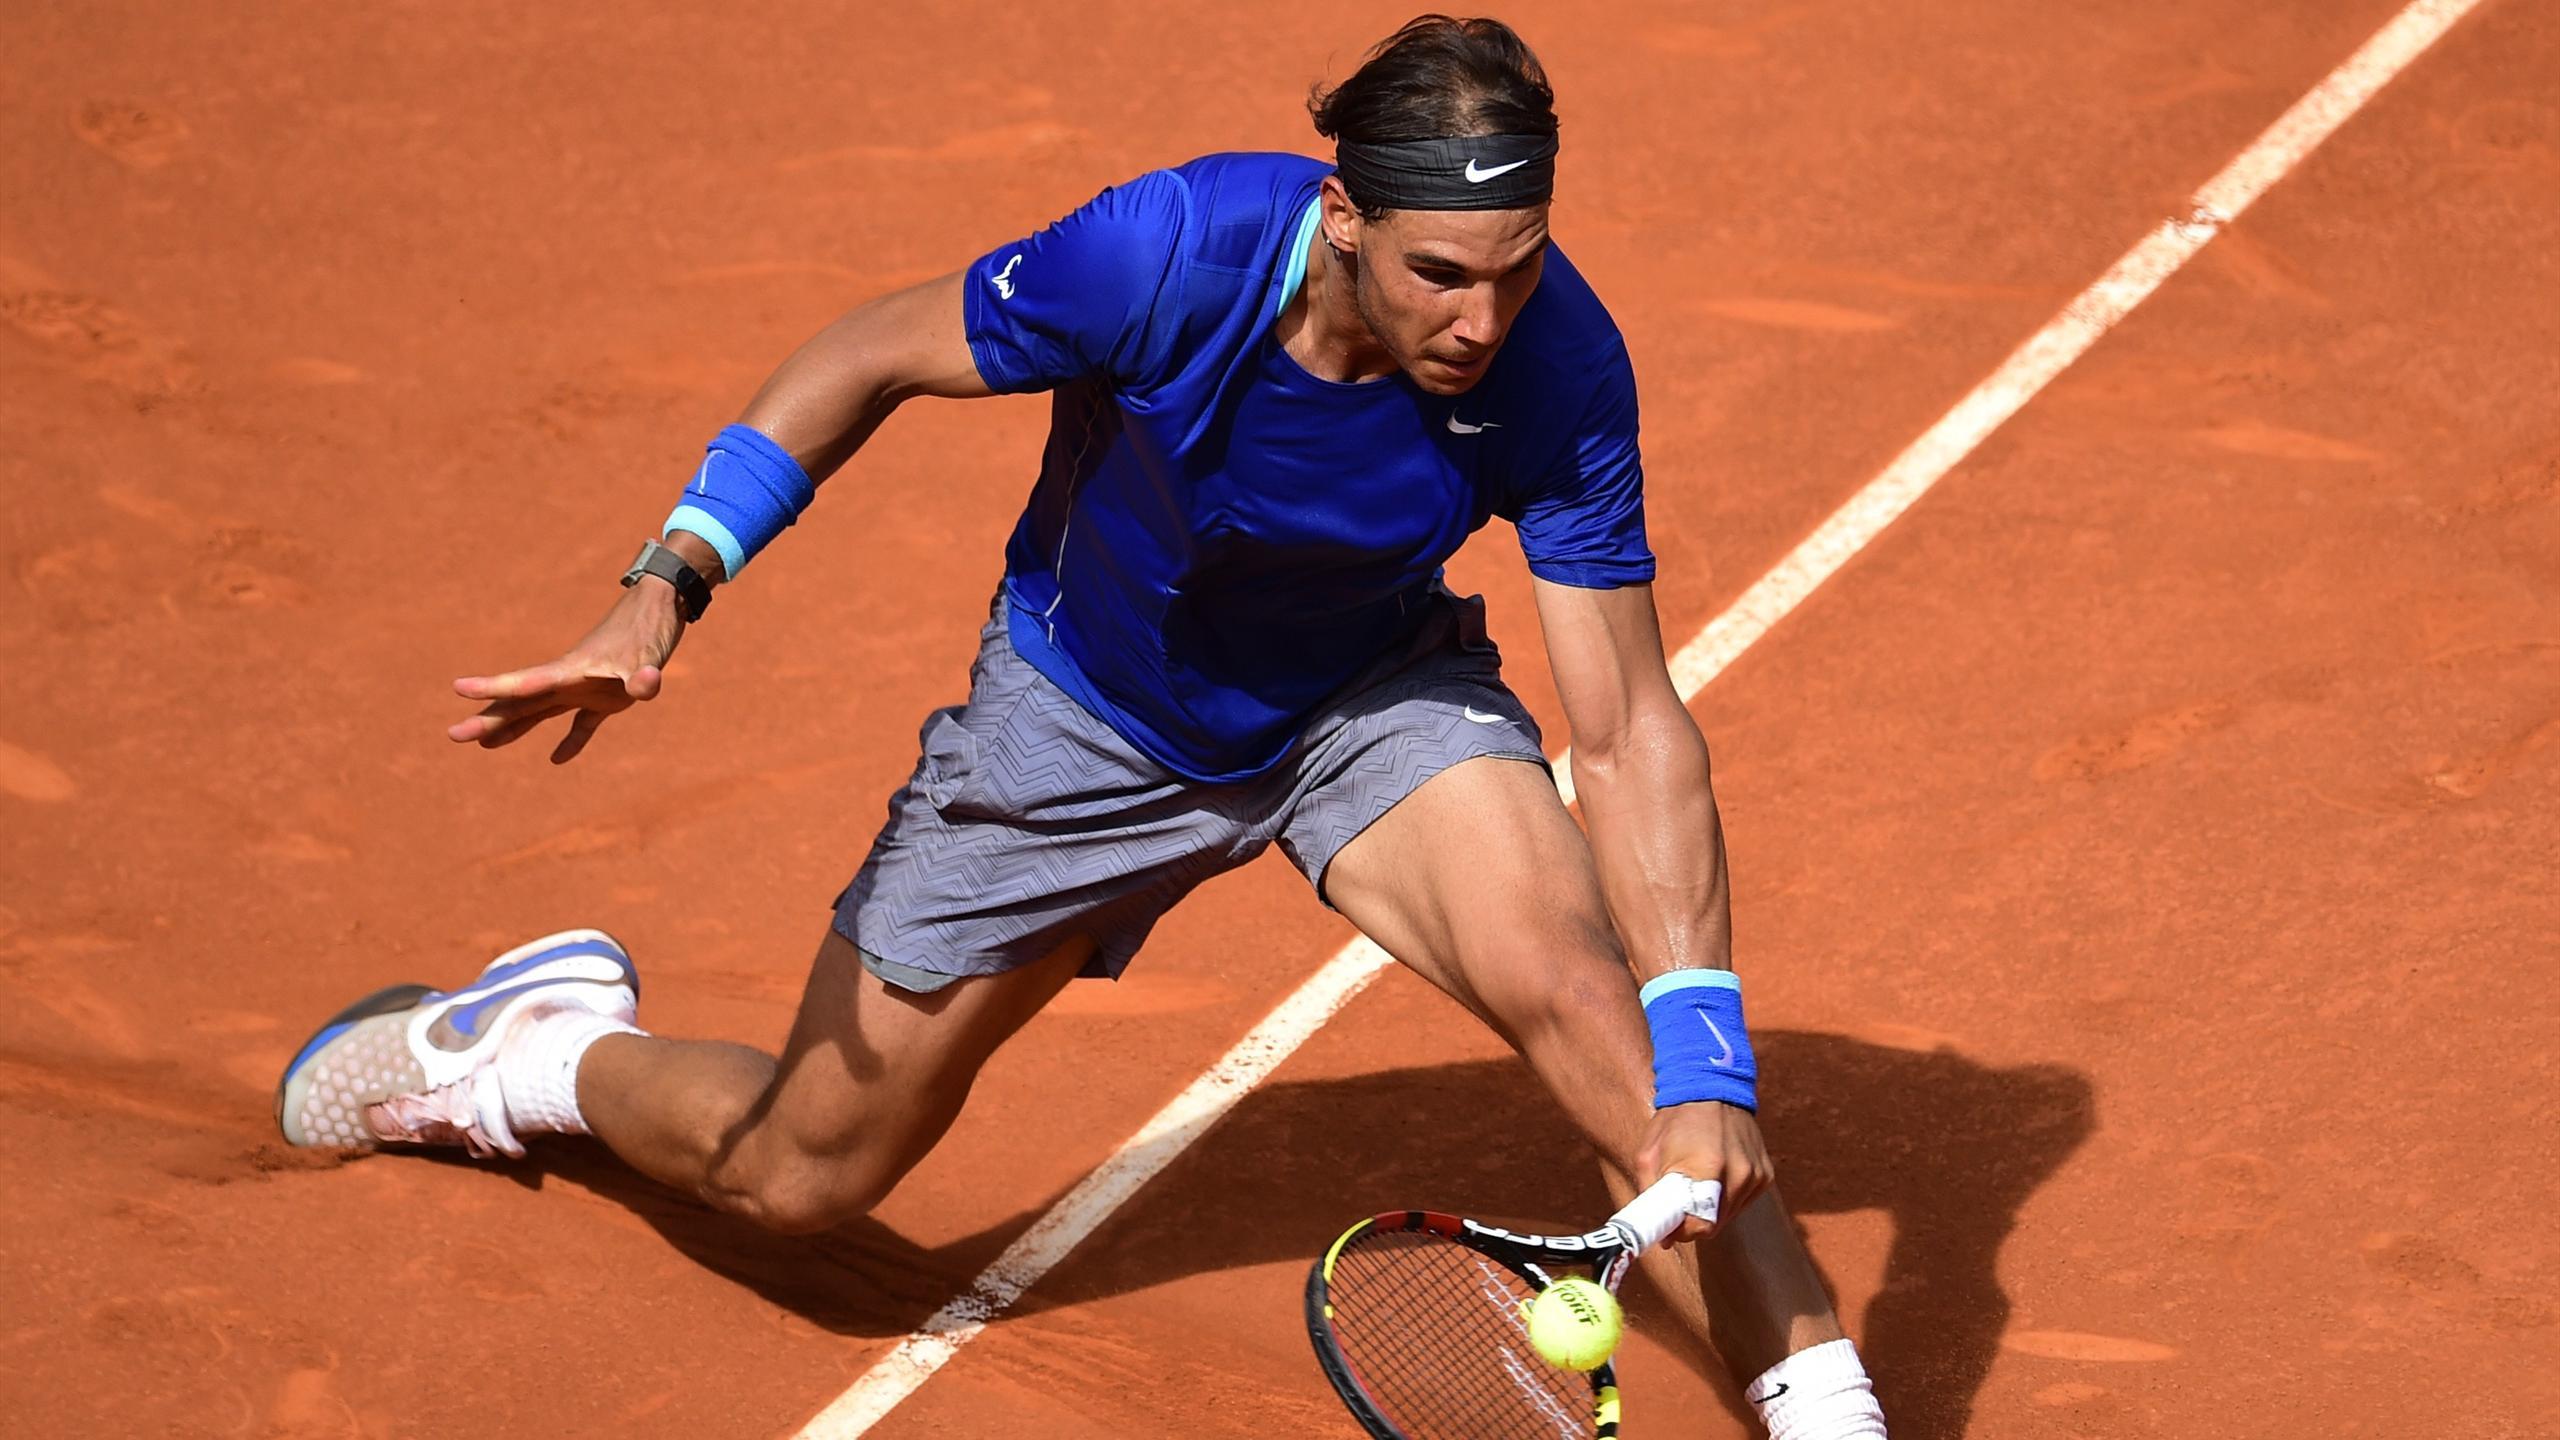 Masters 1000 Madrid : Rafael Nadal a besoin de redevenir